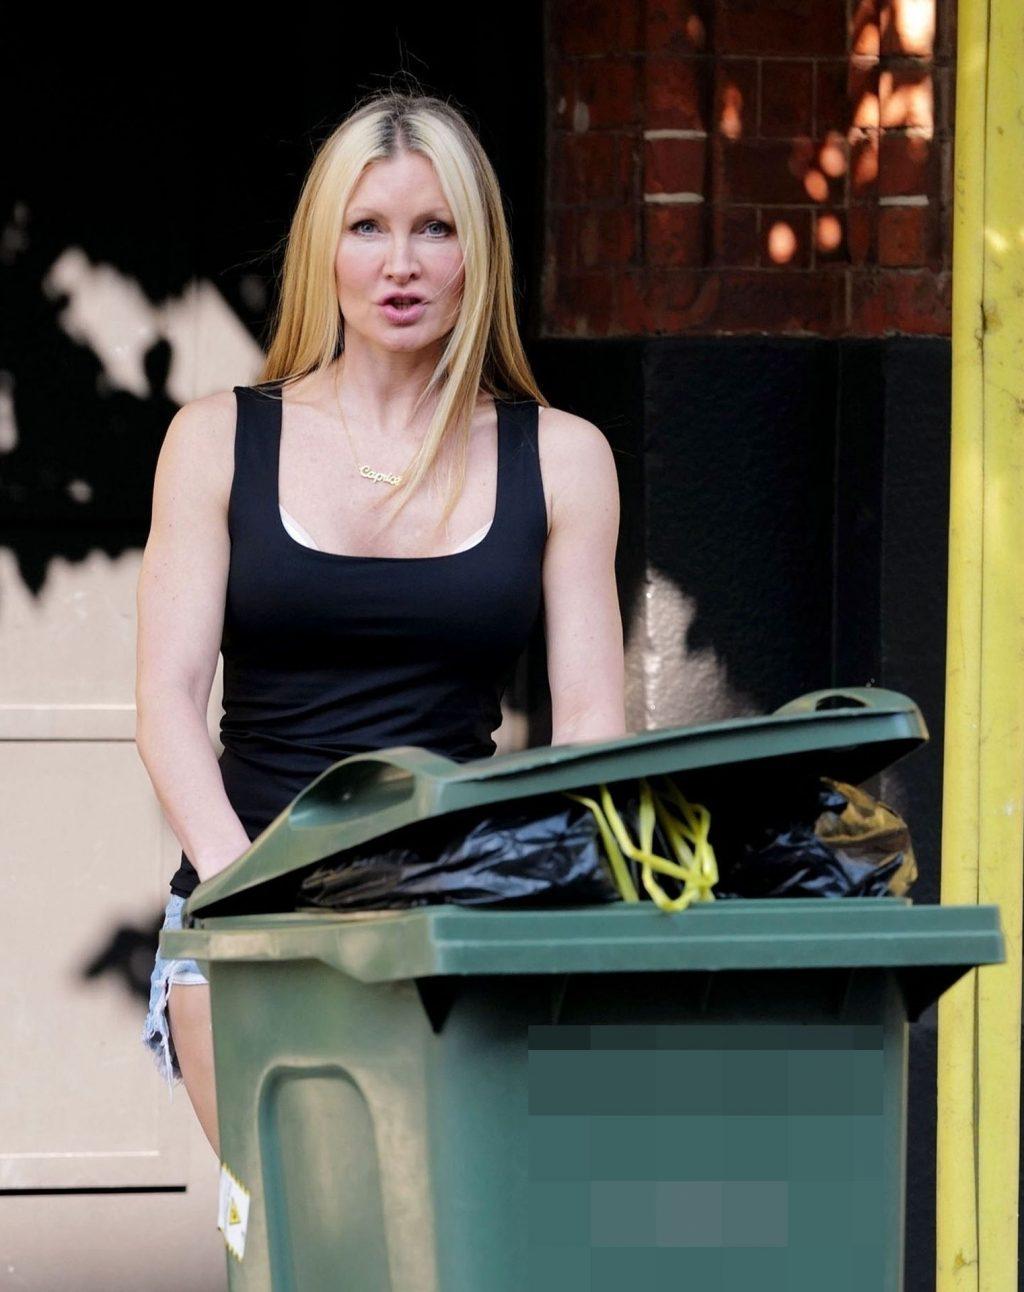 Caprice Was Pictured Wearing Denim Shorts During the Coronavirus Lockdown in London (12 Photos)